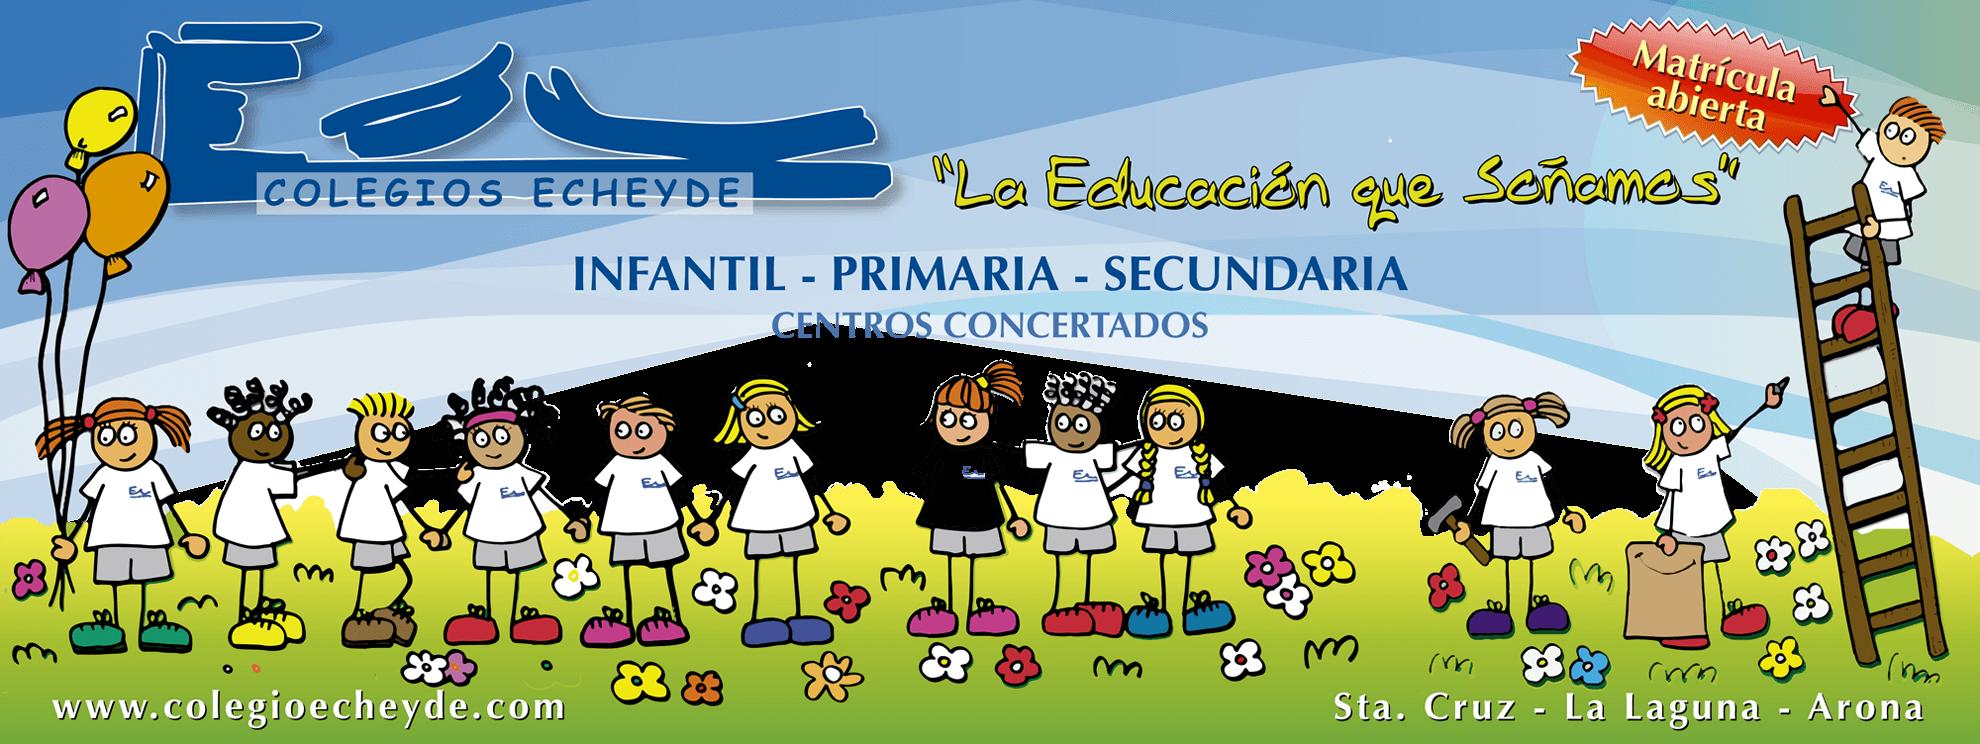 Echeyde_matricula-abierta-2014